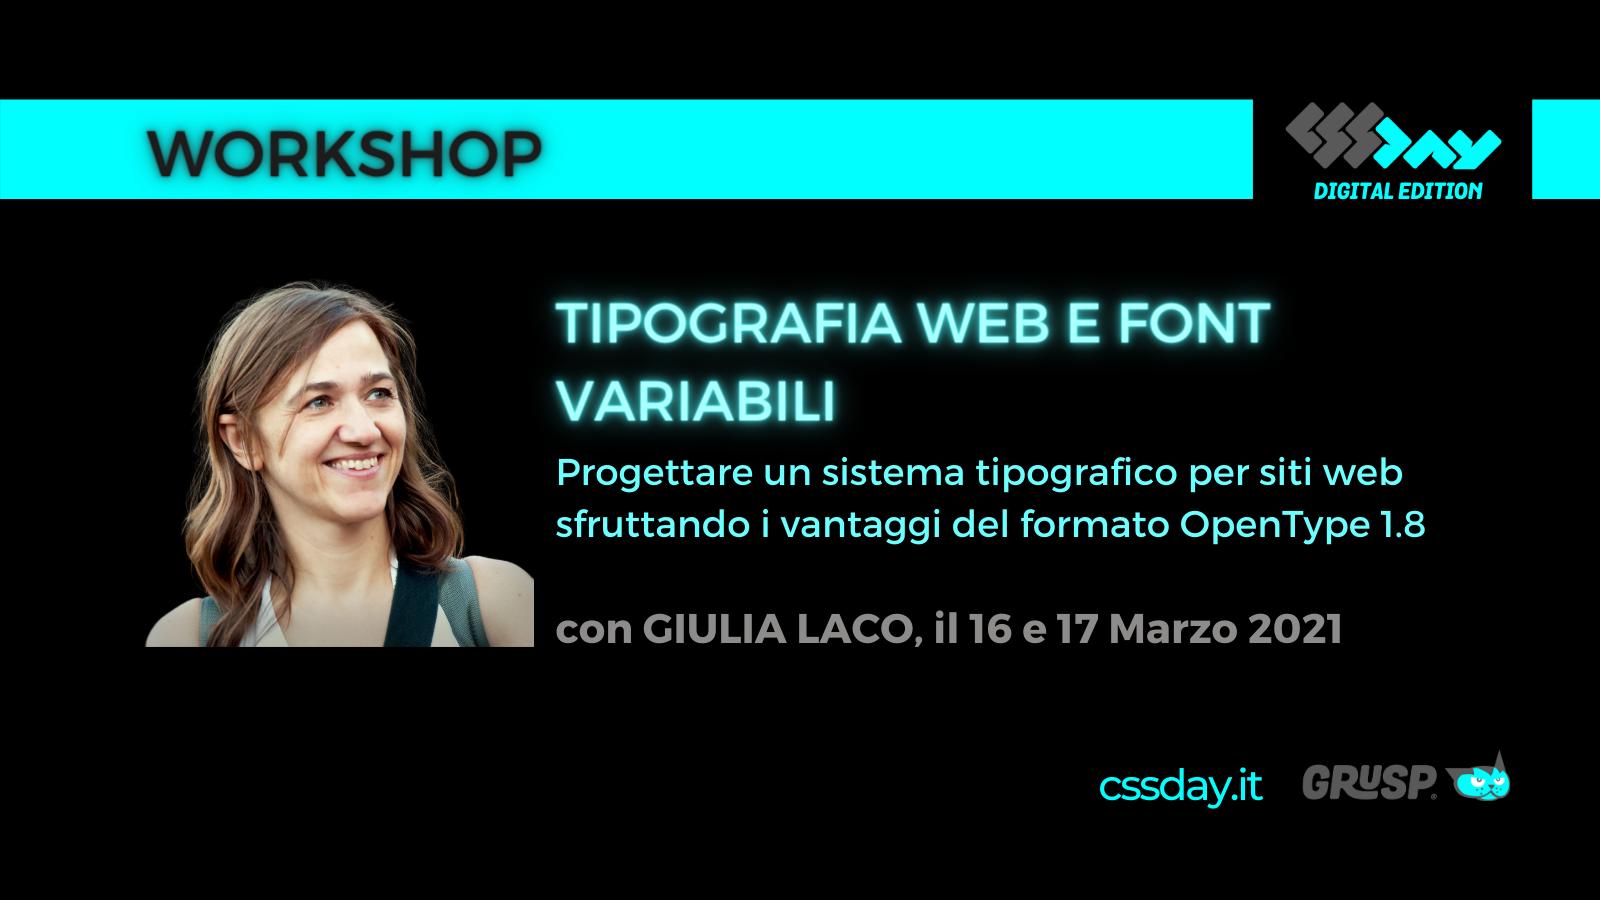 tipografia web e font variabili